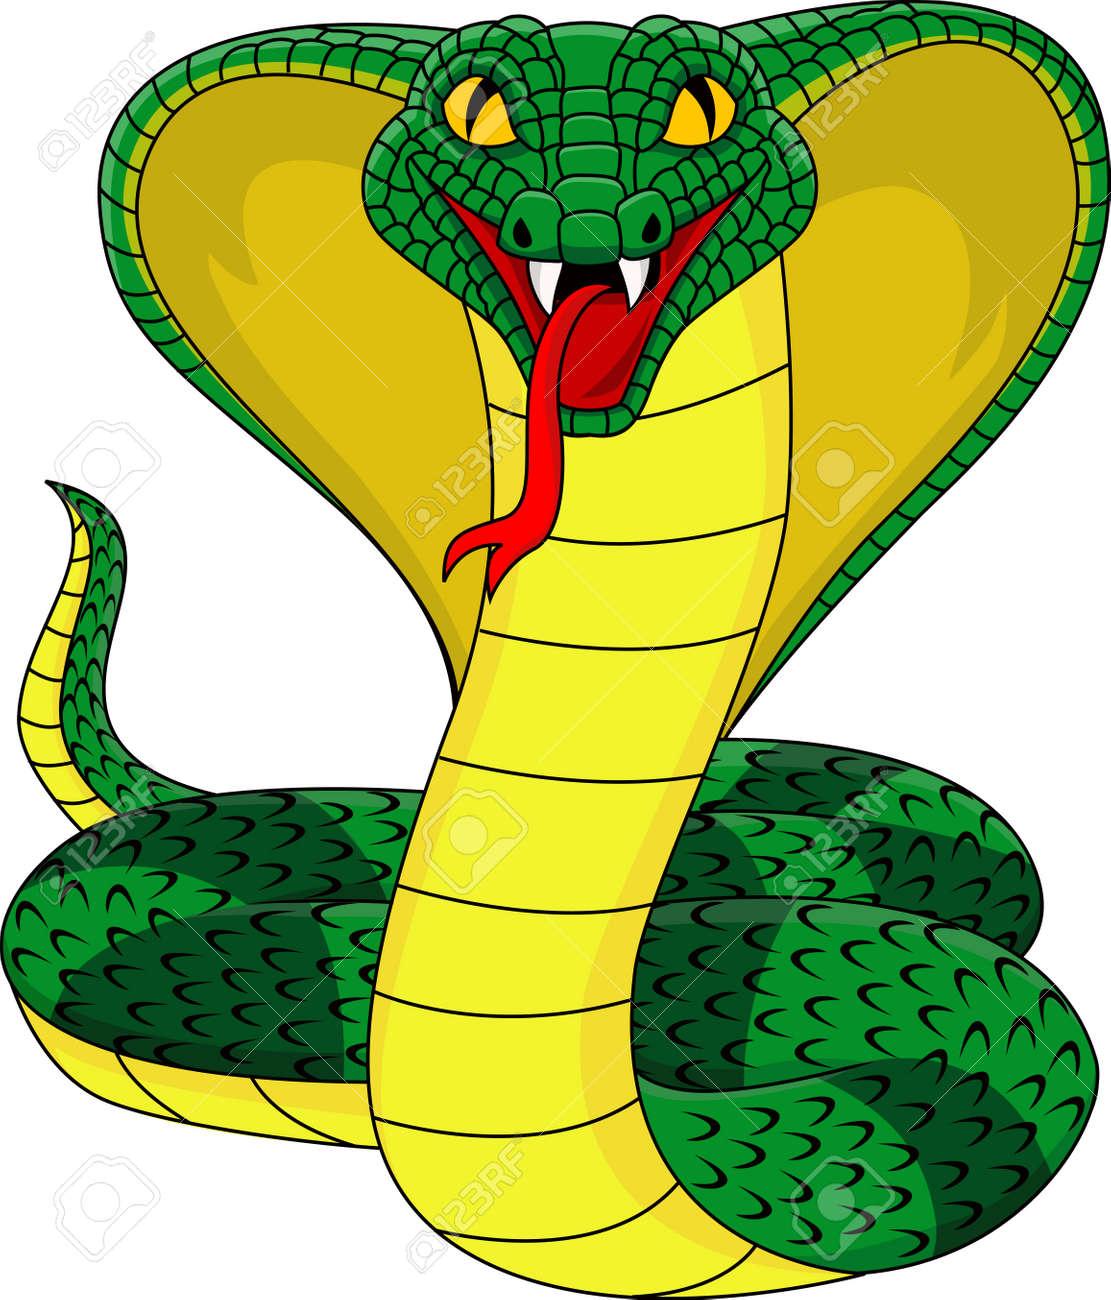 King Cobra Royalty Free Cliparts, Vectors, And Stock Illustration ...